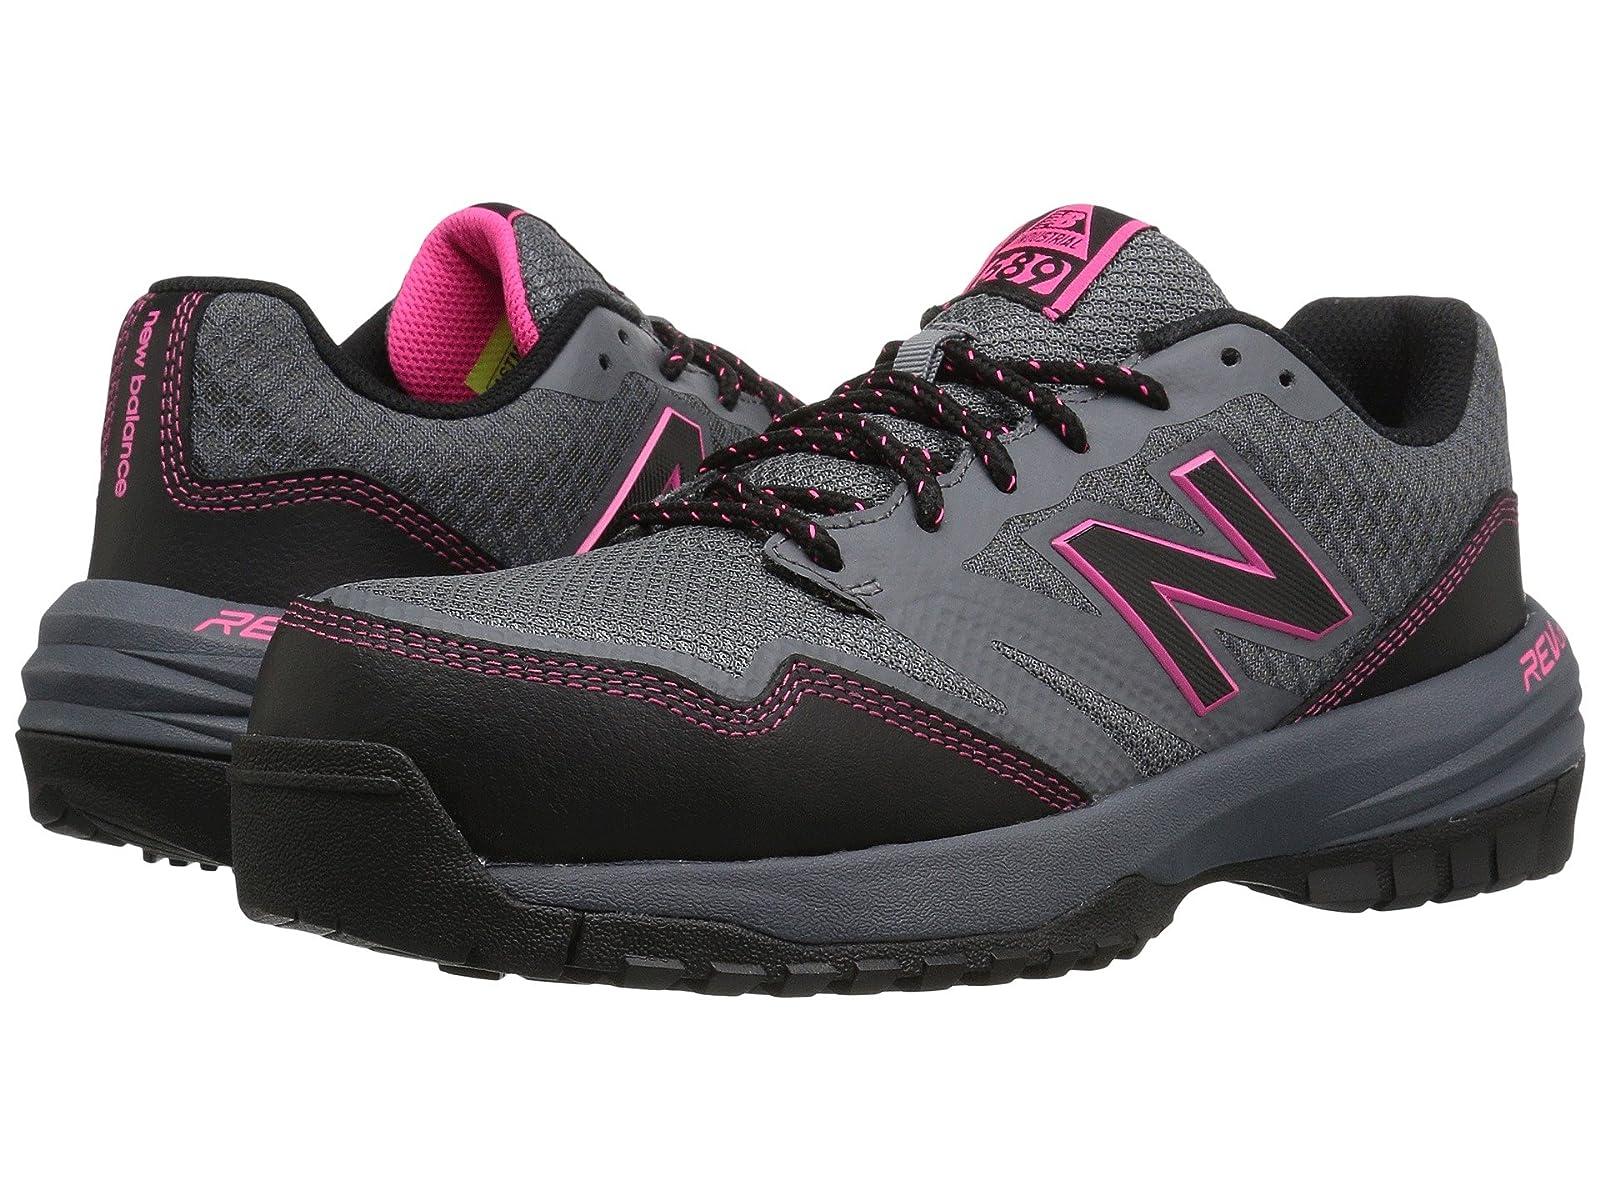 New Balance 589v1Atmospheric grades have affordable shoes